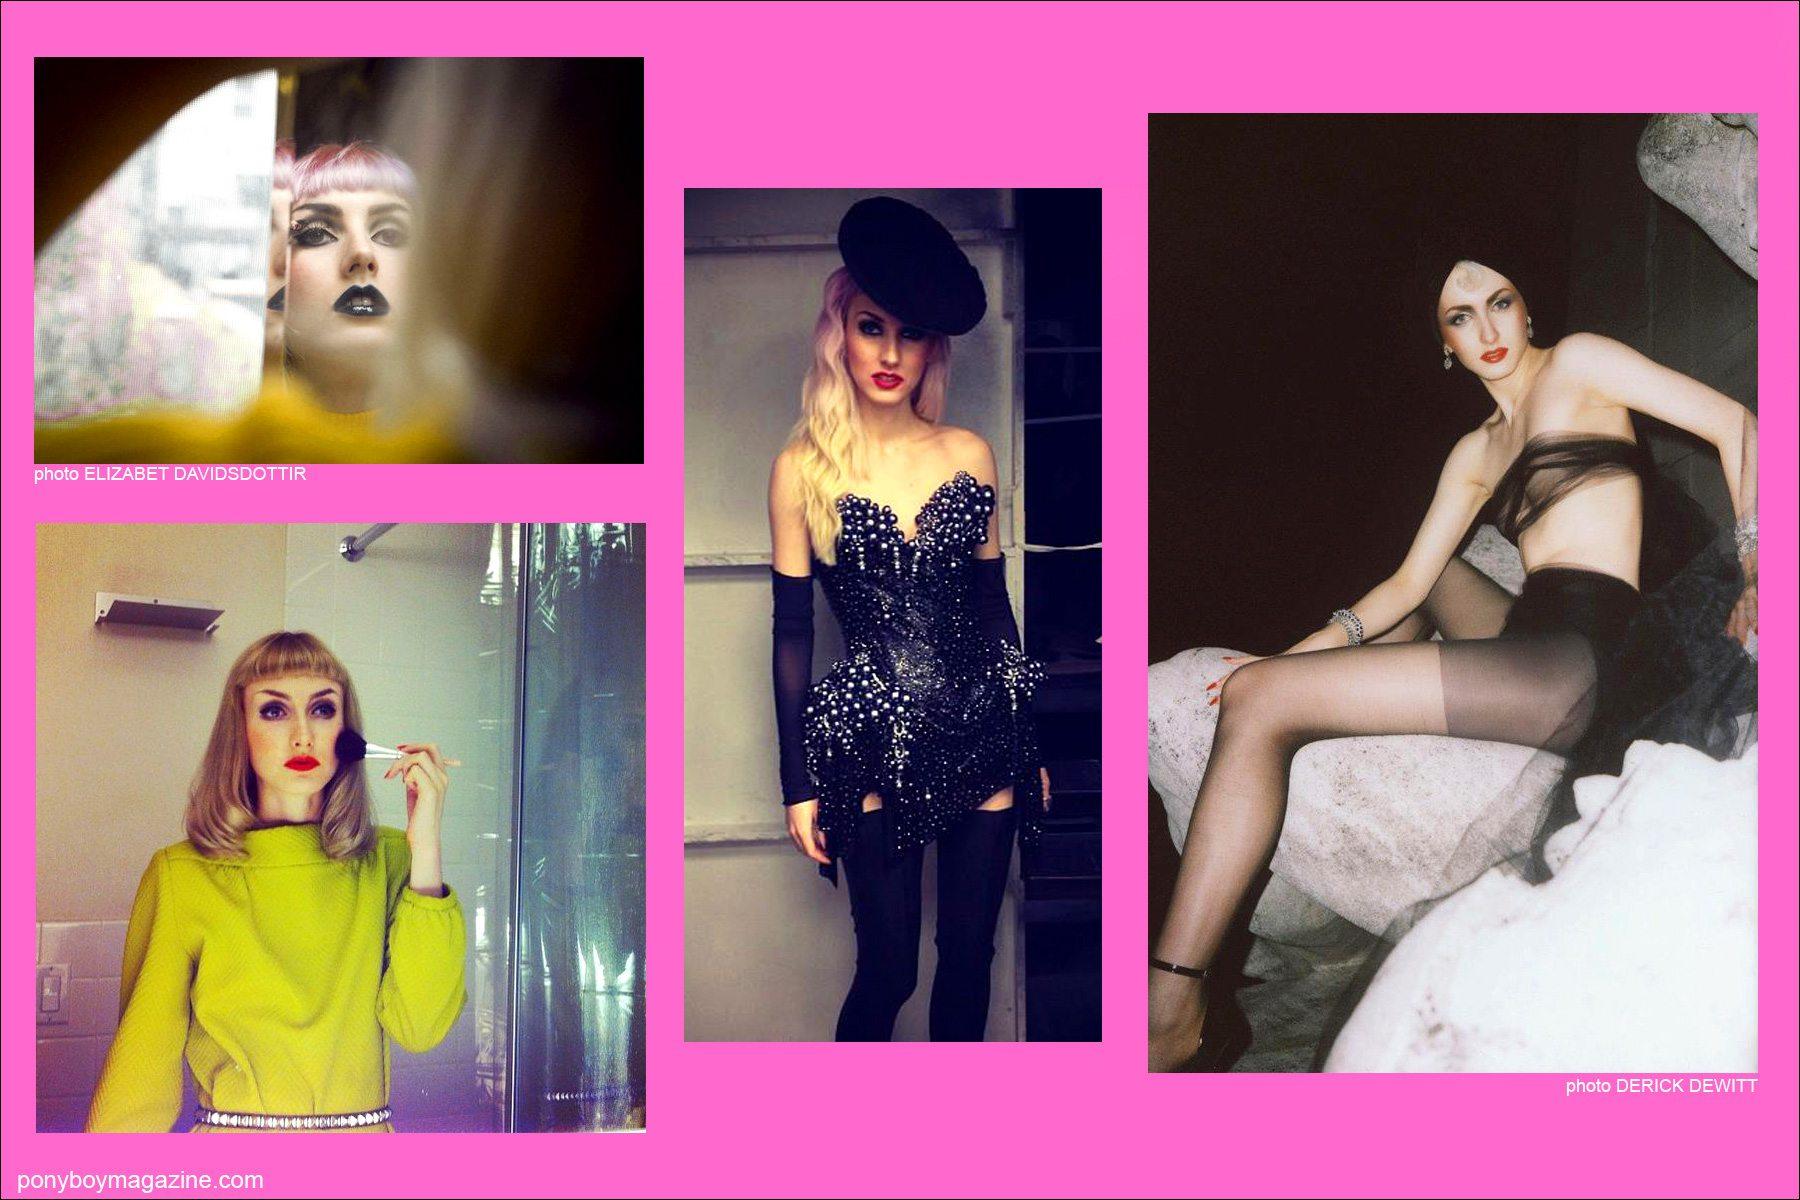 The beautiful New York City model Stella Rose Saint Clair for Ponyboy Magazine.